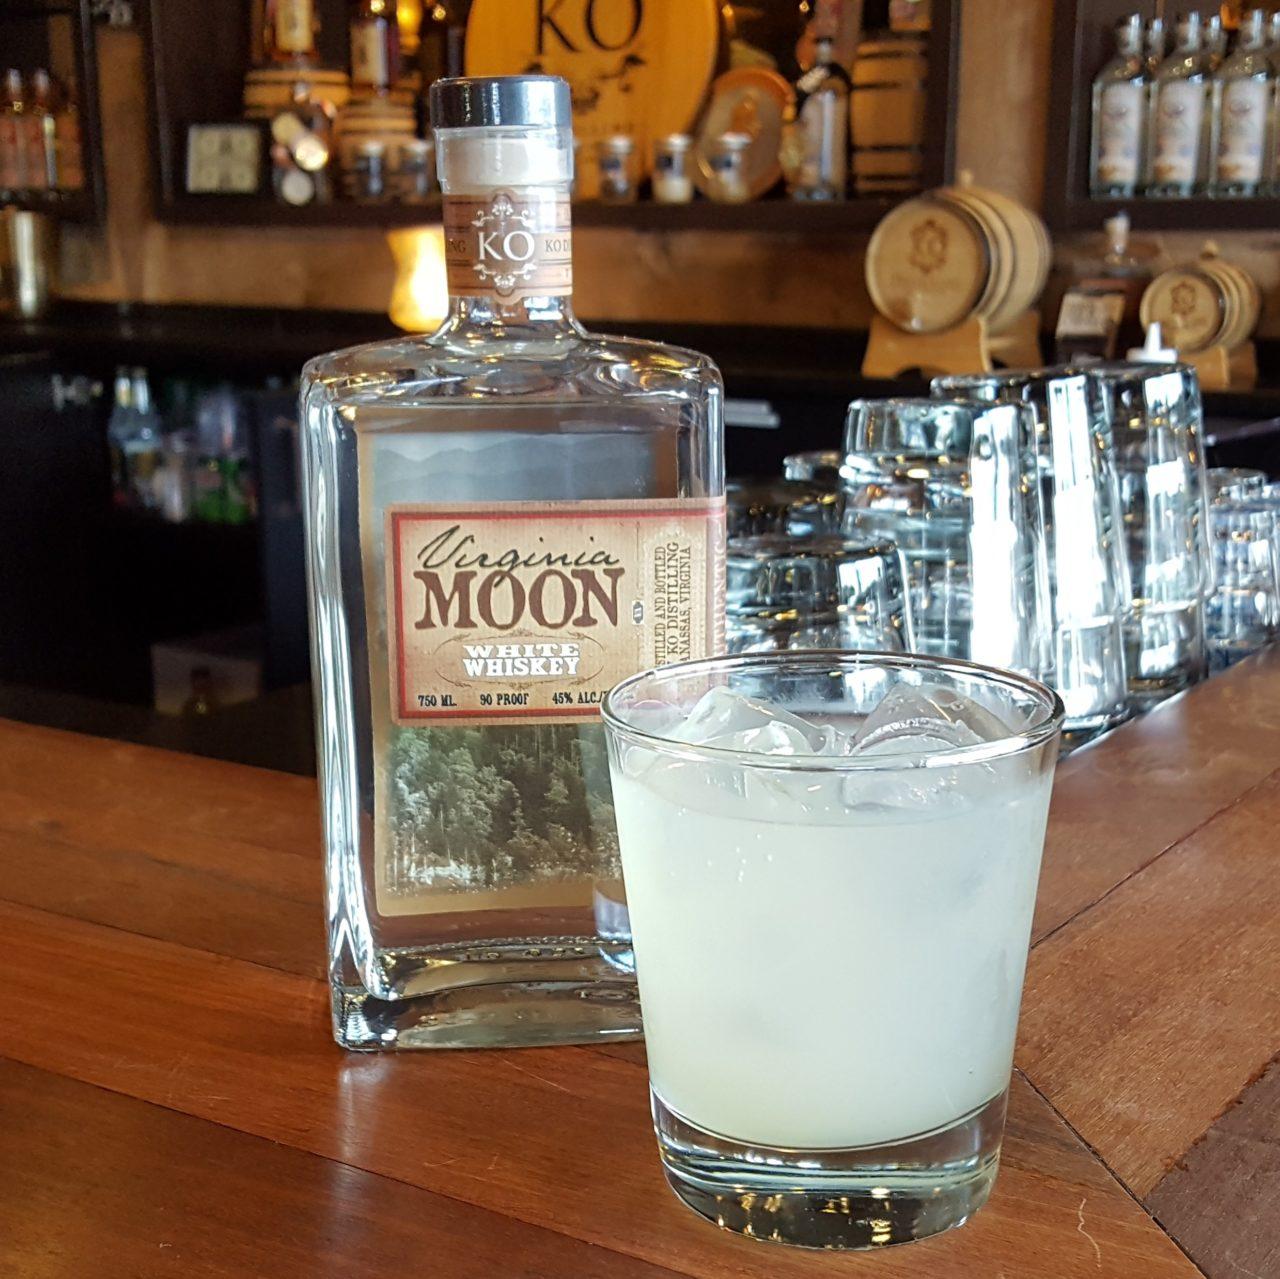 KO-Distilling_Virginia-Moon-White-Whiskey_Manassas-Mule-1280x1279.jpg